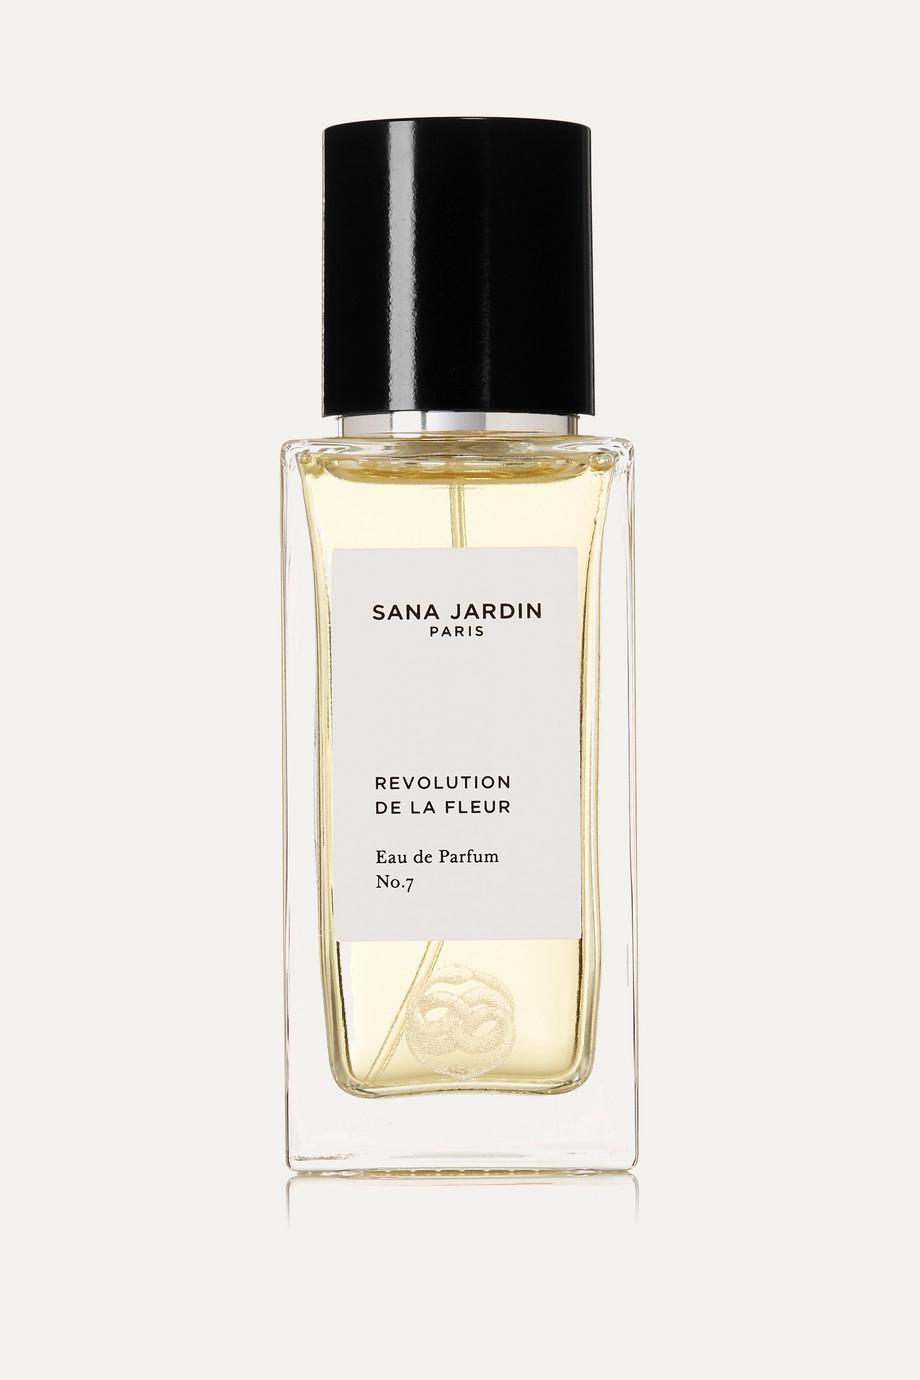 Sana Jardin + NET SUSTAIN Eau de Parfum - Revolution de la Fleur, 50ml